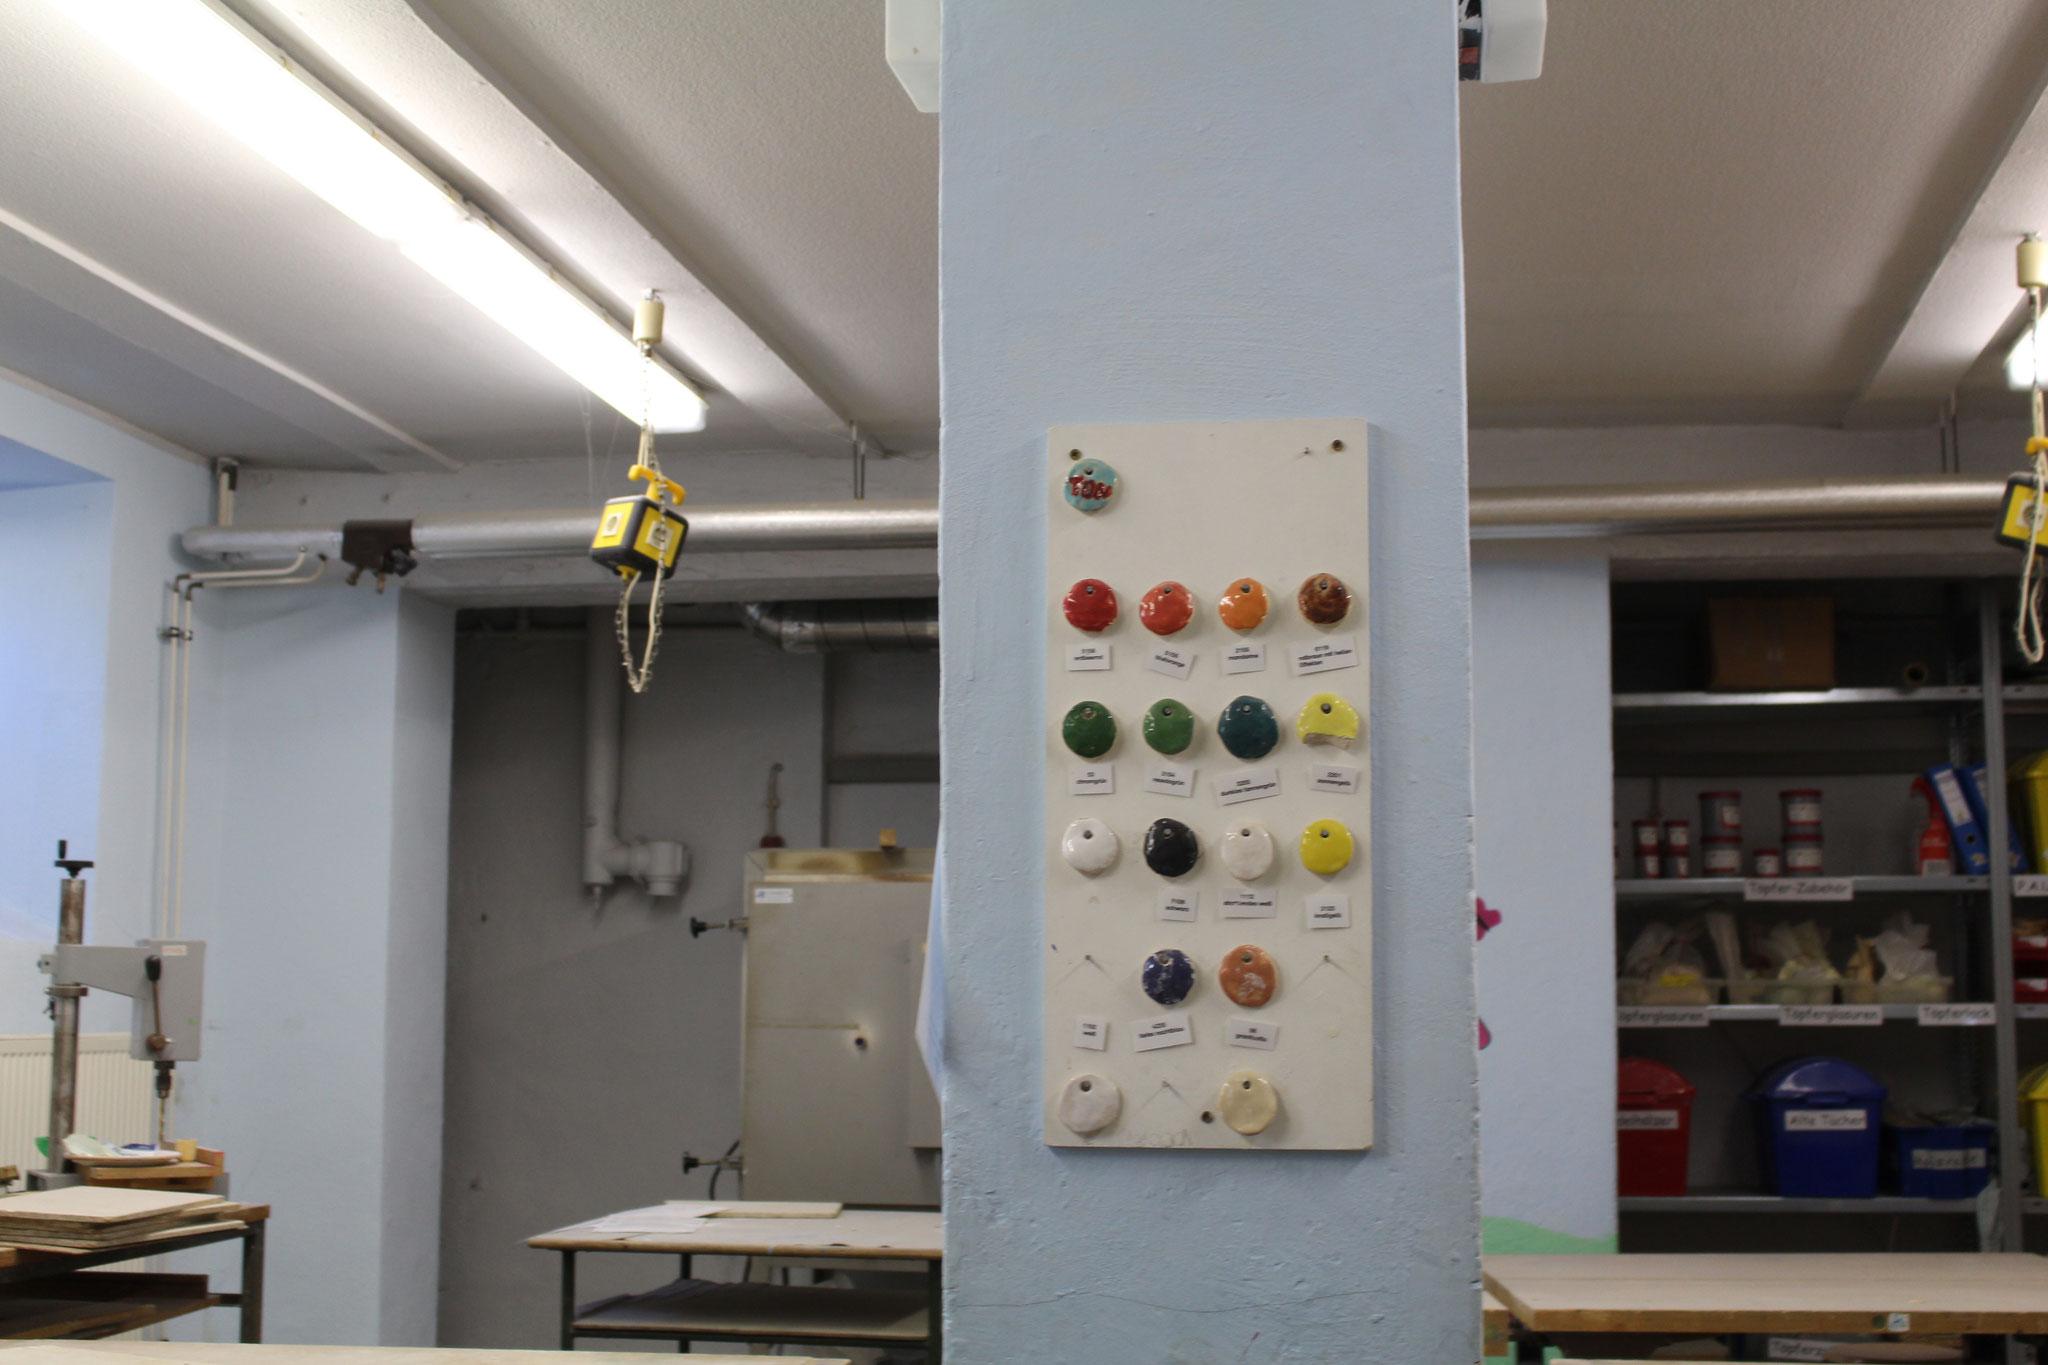 Im Werk Raum. Fotograf: LUKAS,LEANDROS